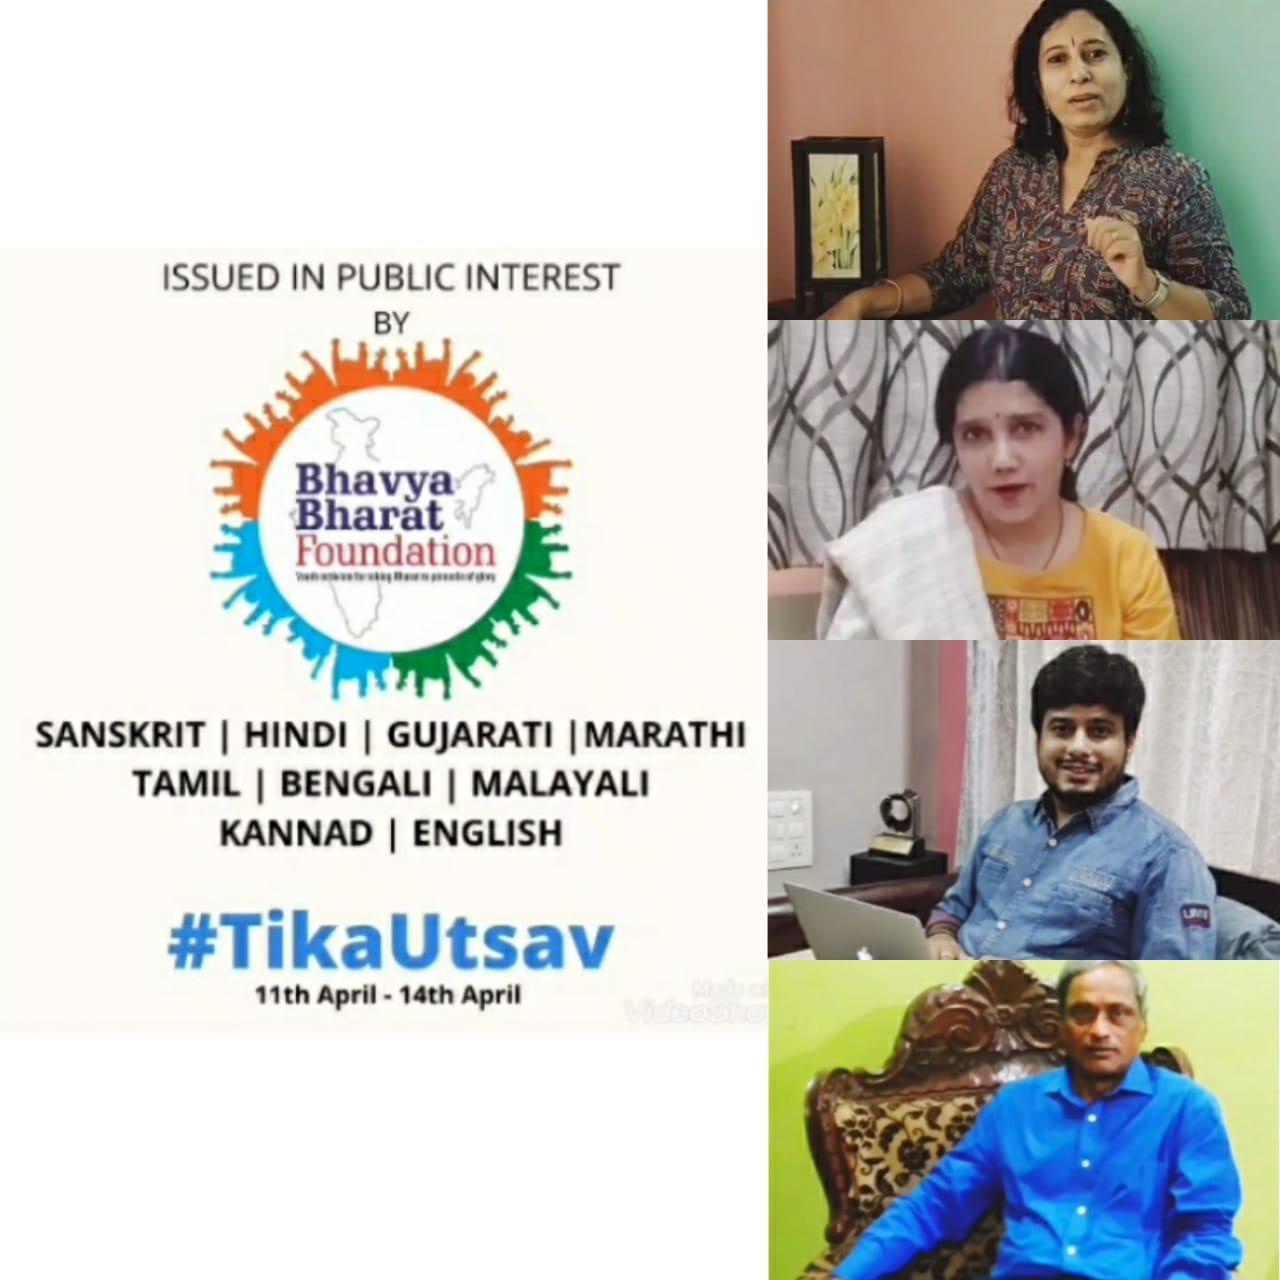 Tika Utsav Awareness Campaign by Bhavya Bharat Foundation